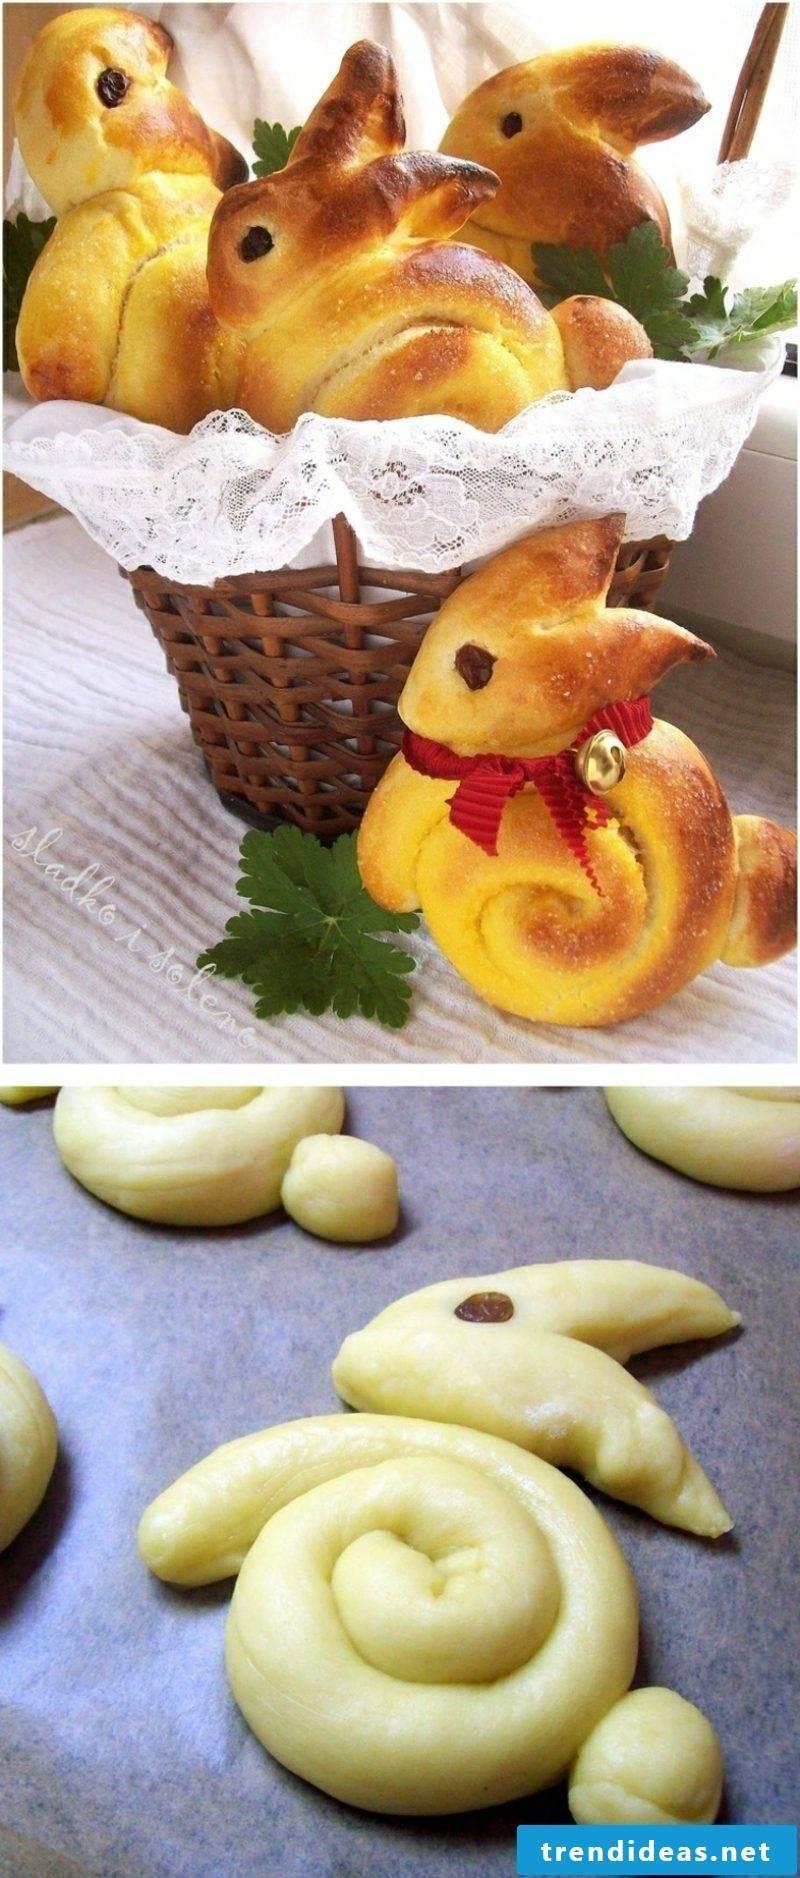 Easter presents make Easter biscuits